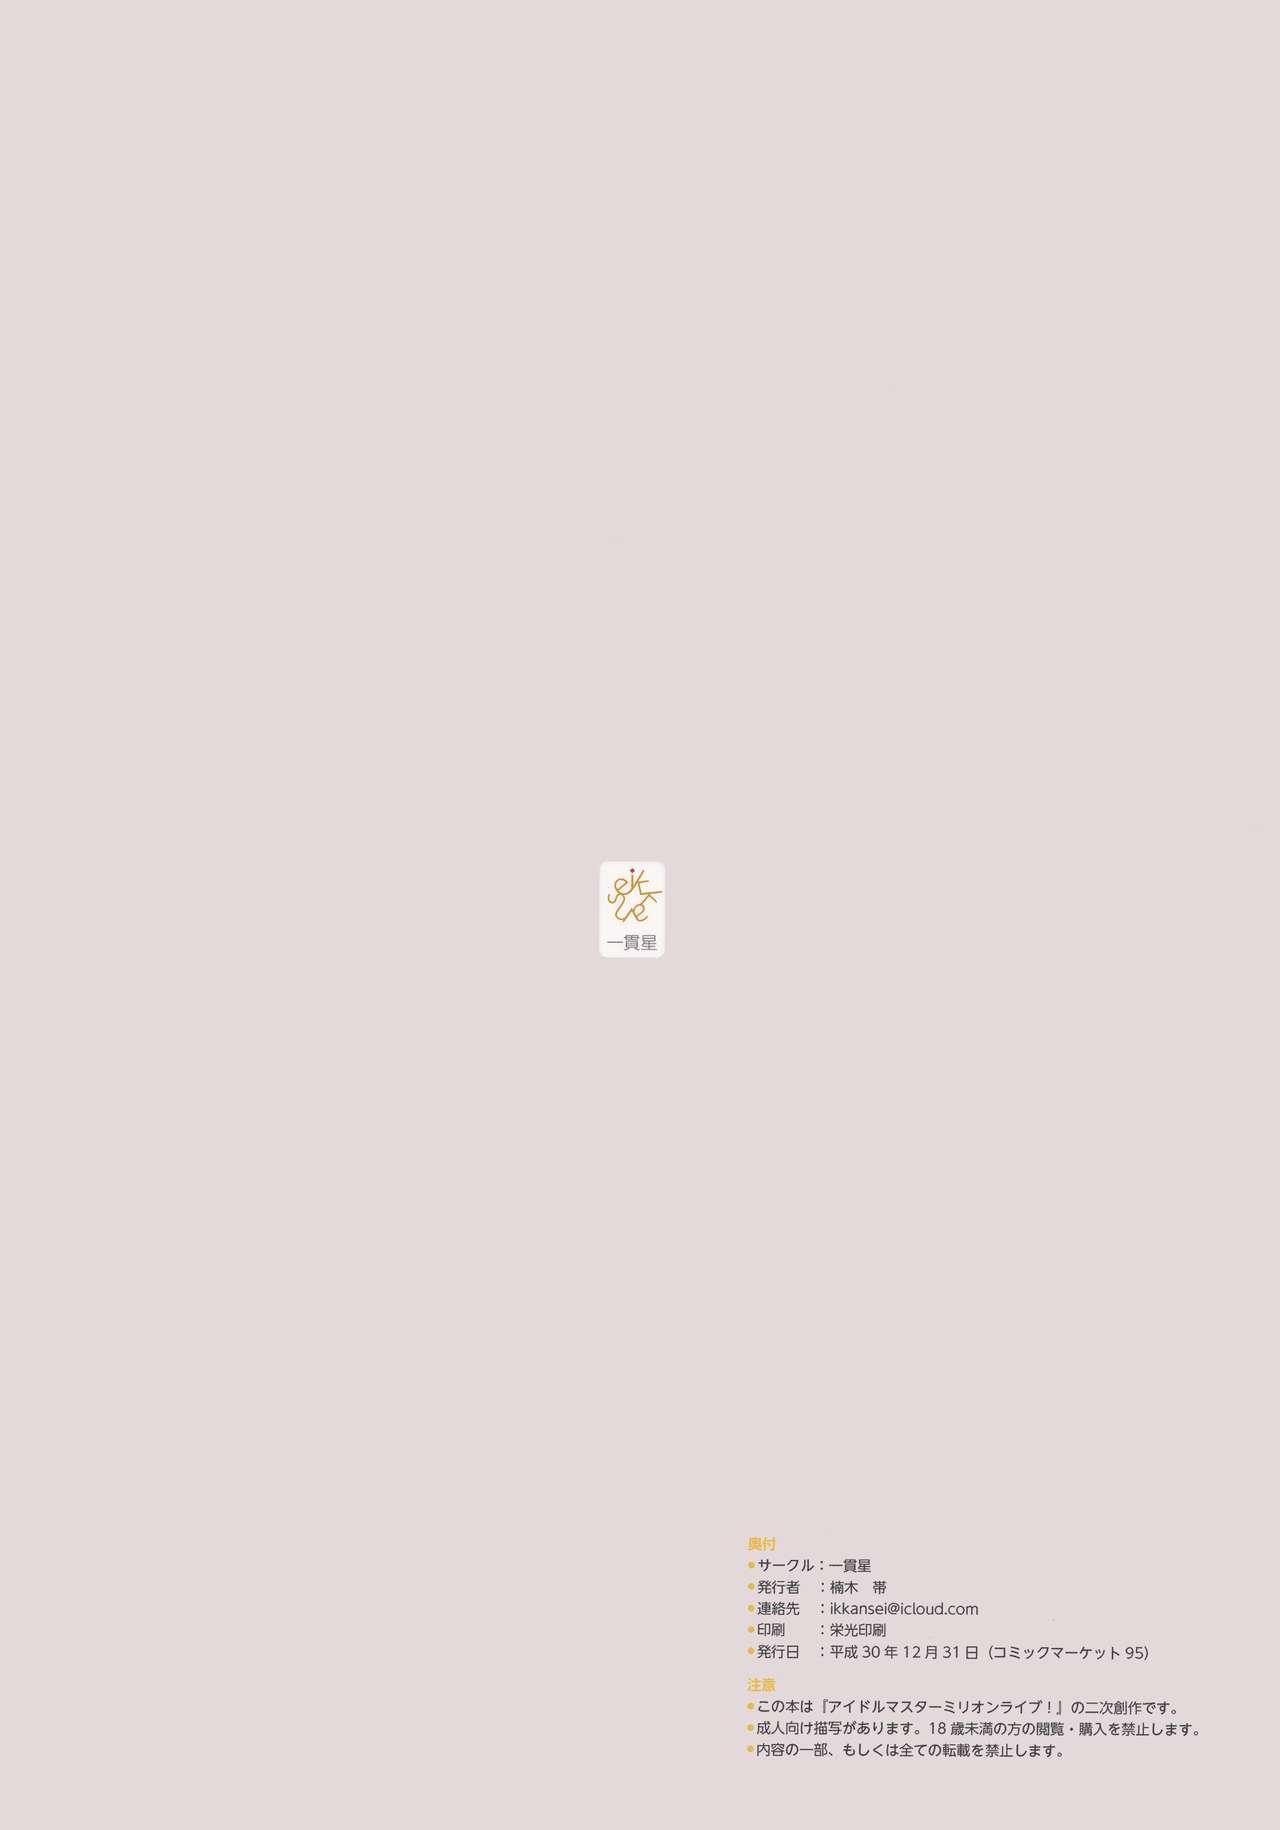 [Ikkansei (Kusugi Tai)] [#8/Fantasia] (THE IDOLM@STER MILLION LIVE!) [Chinese] [黄记汉化组][Digital] 23